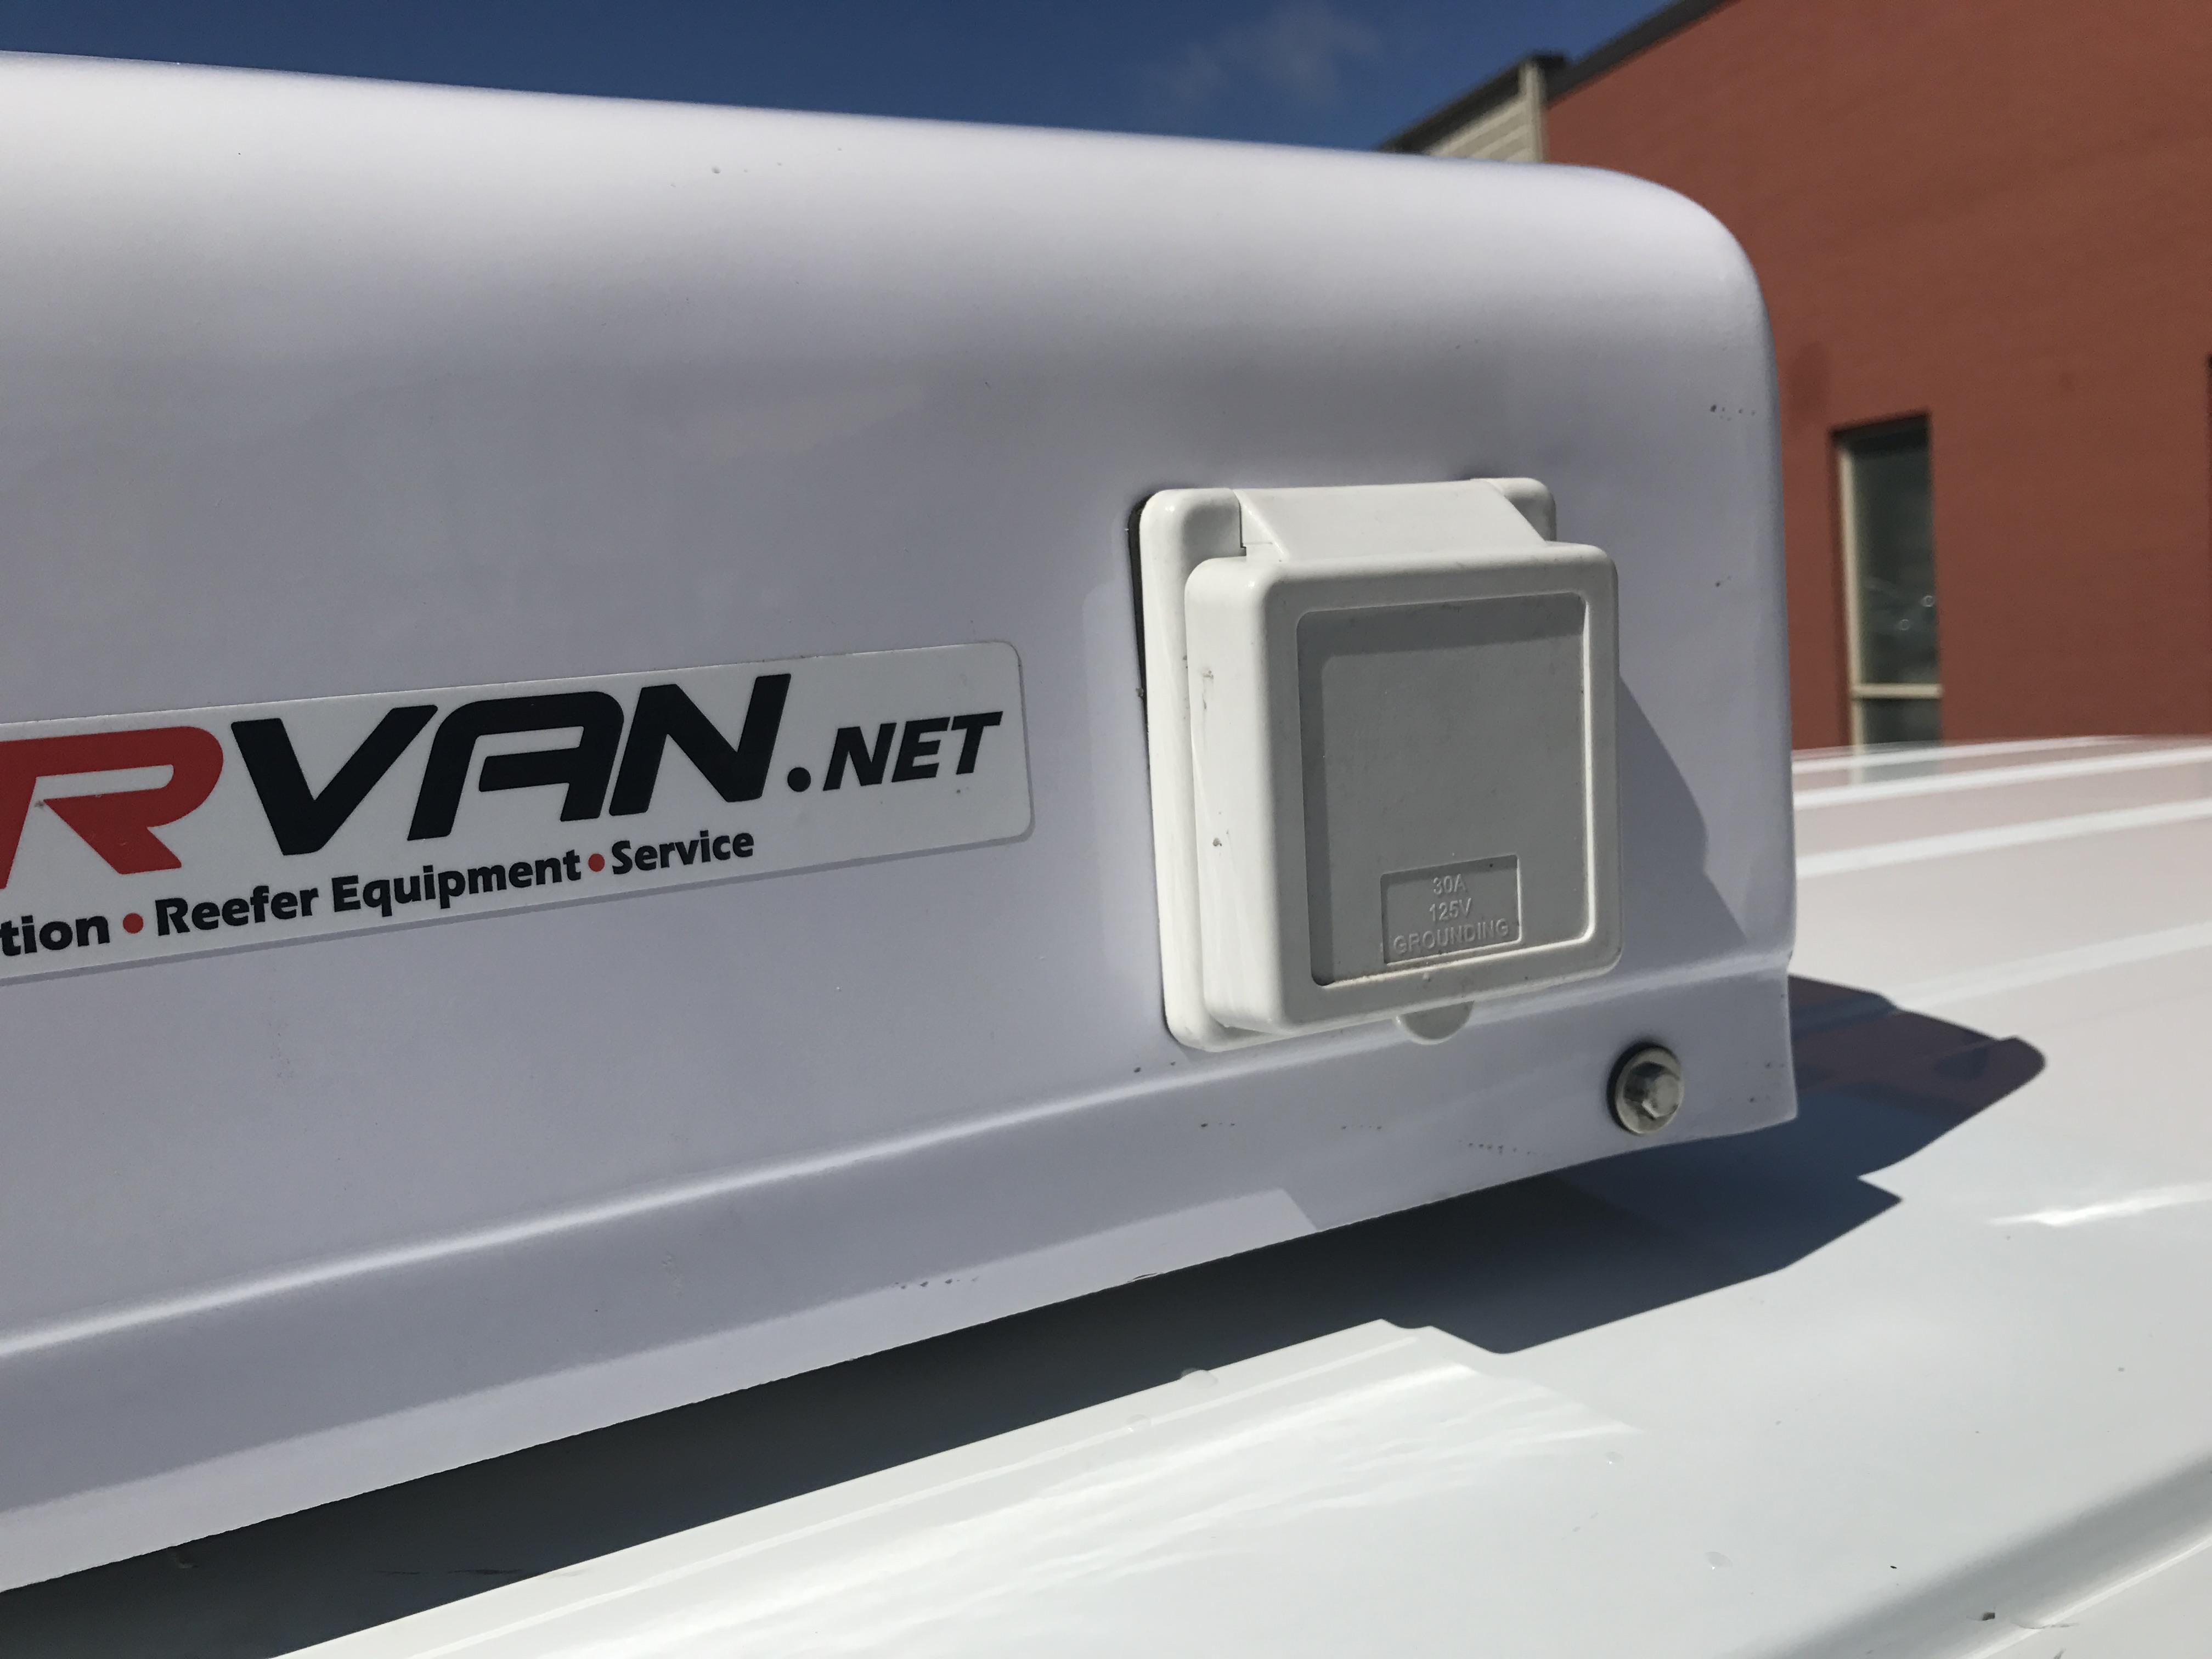 110v Appliance Inlet RV9E Side of Reefer